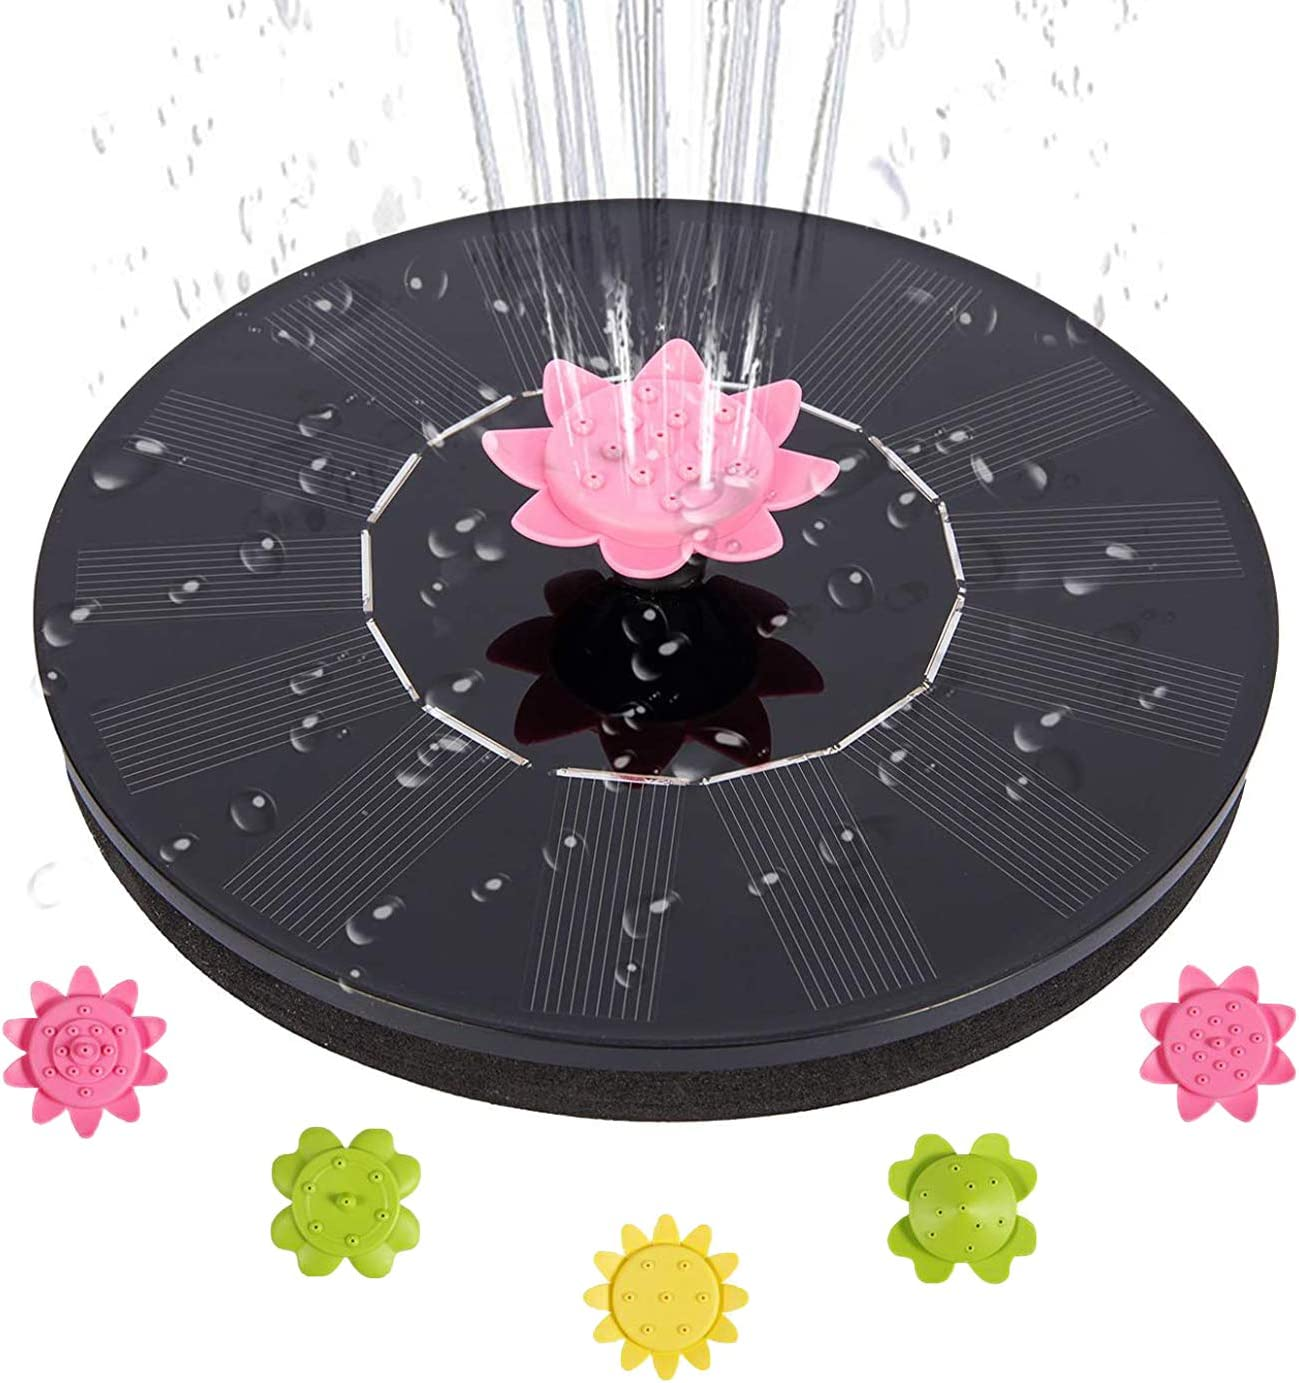 Solar Fountain Pump, 1.4W Solar Powered Fountain Pump with 5 Easy Install Nozzles, Solar Bird Bath Fountain Pump for Pond, Pool, Fish Tank, Aquarium and Garden